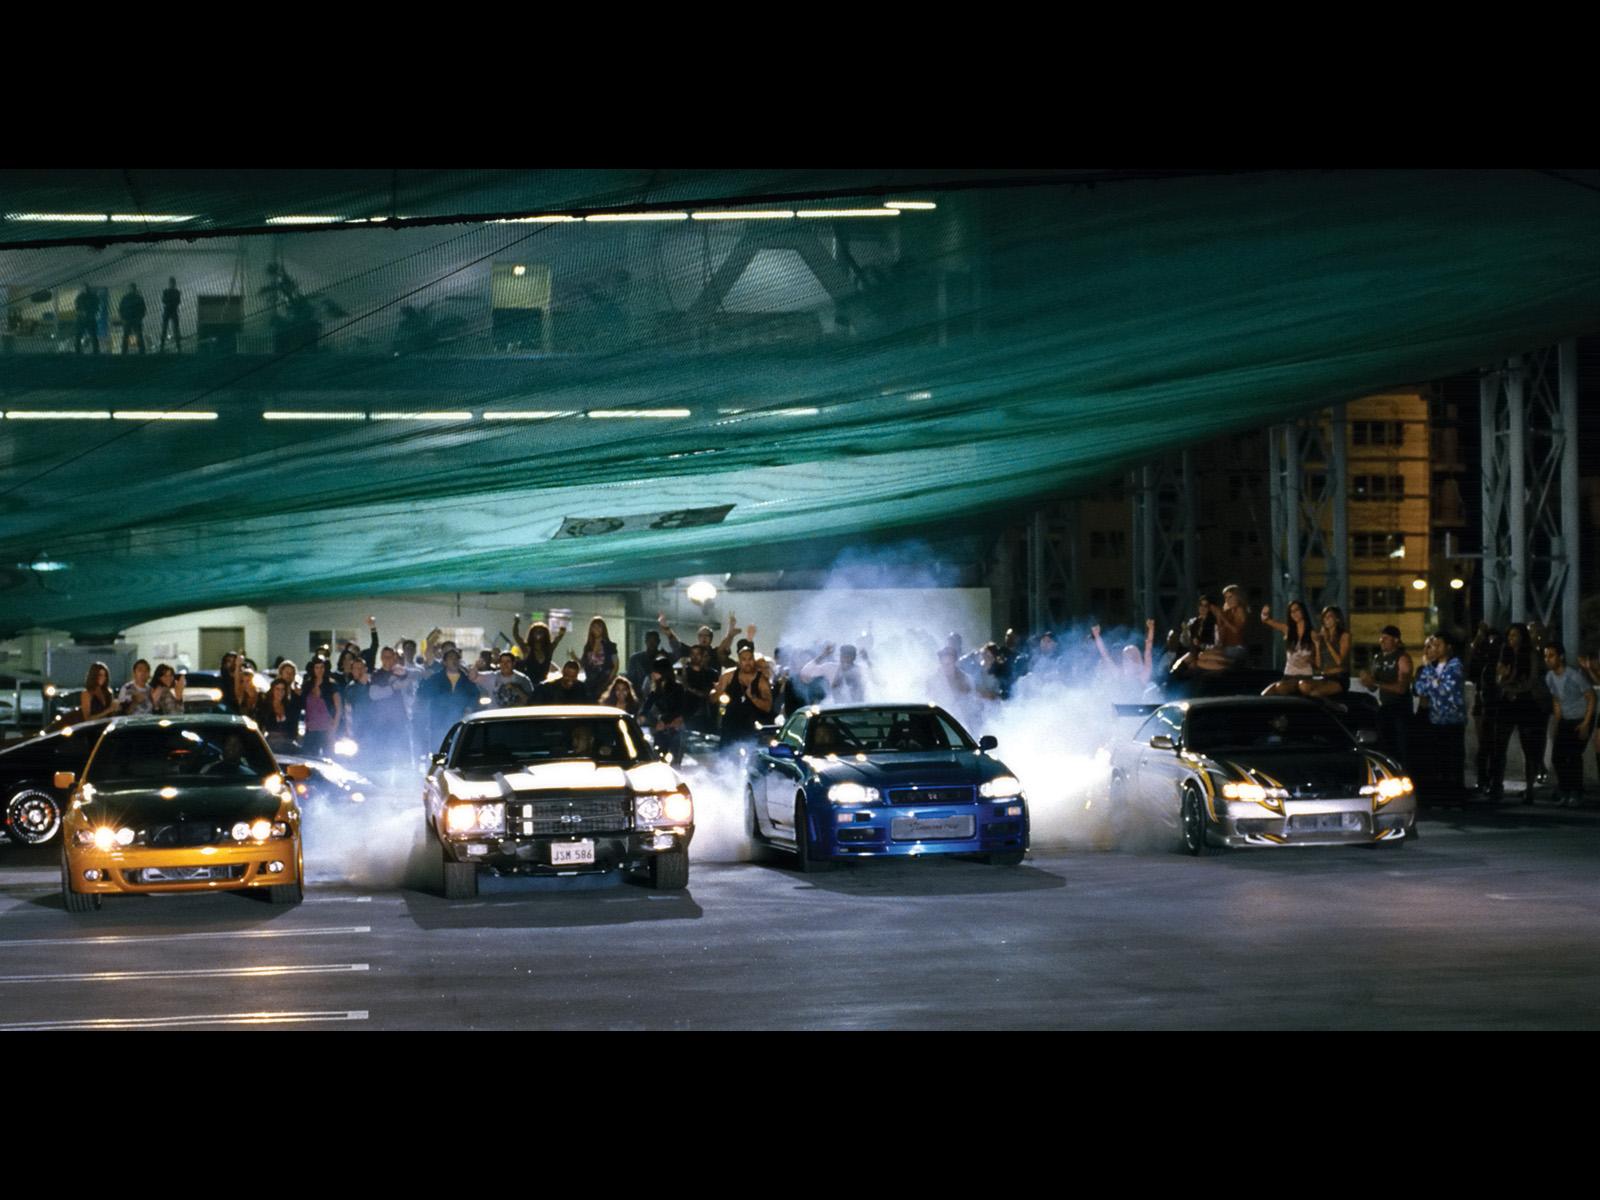 Fast Furious Movie Cars   Race   1600x1200   Wallpaper 1600x1200